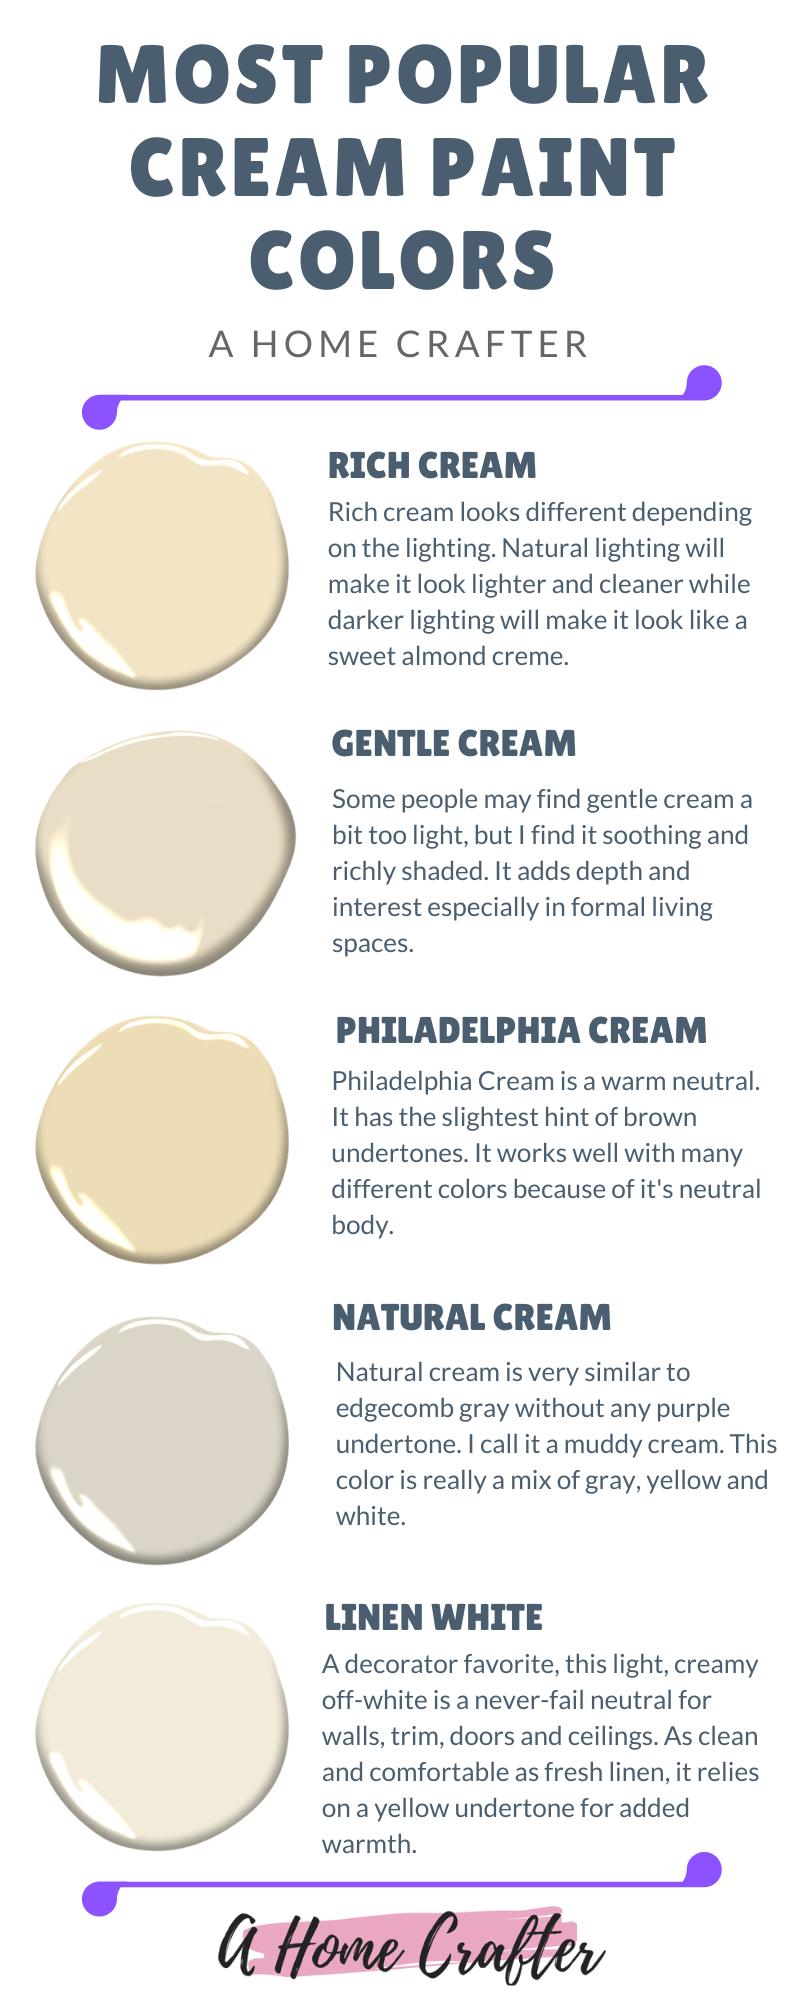 What Color Is Cream : color, cream, Popular, Benjamin, Moore, Cream, Paint, Colors, Colors,, Paint,